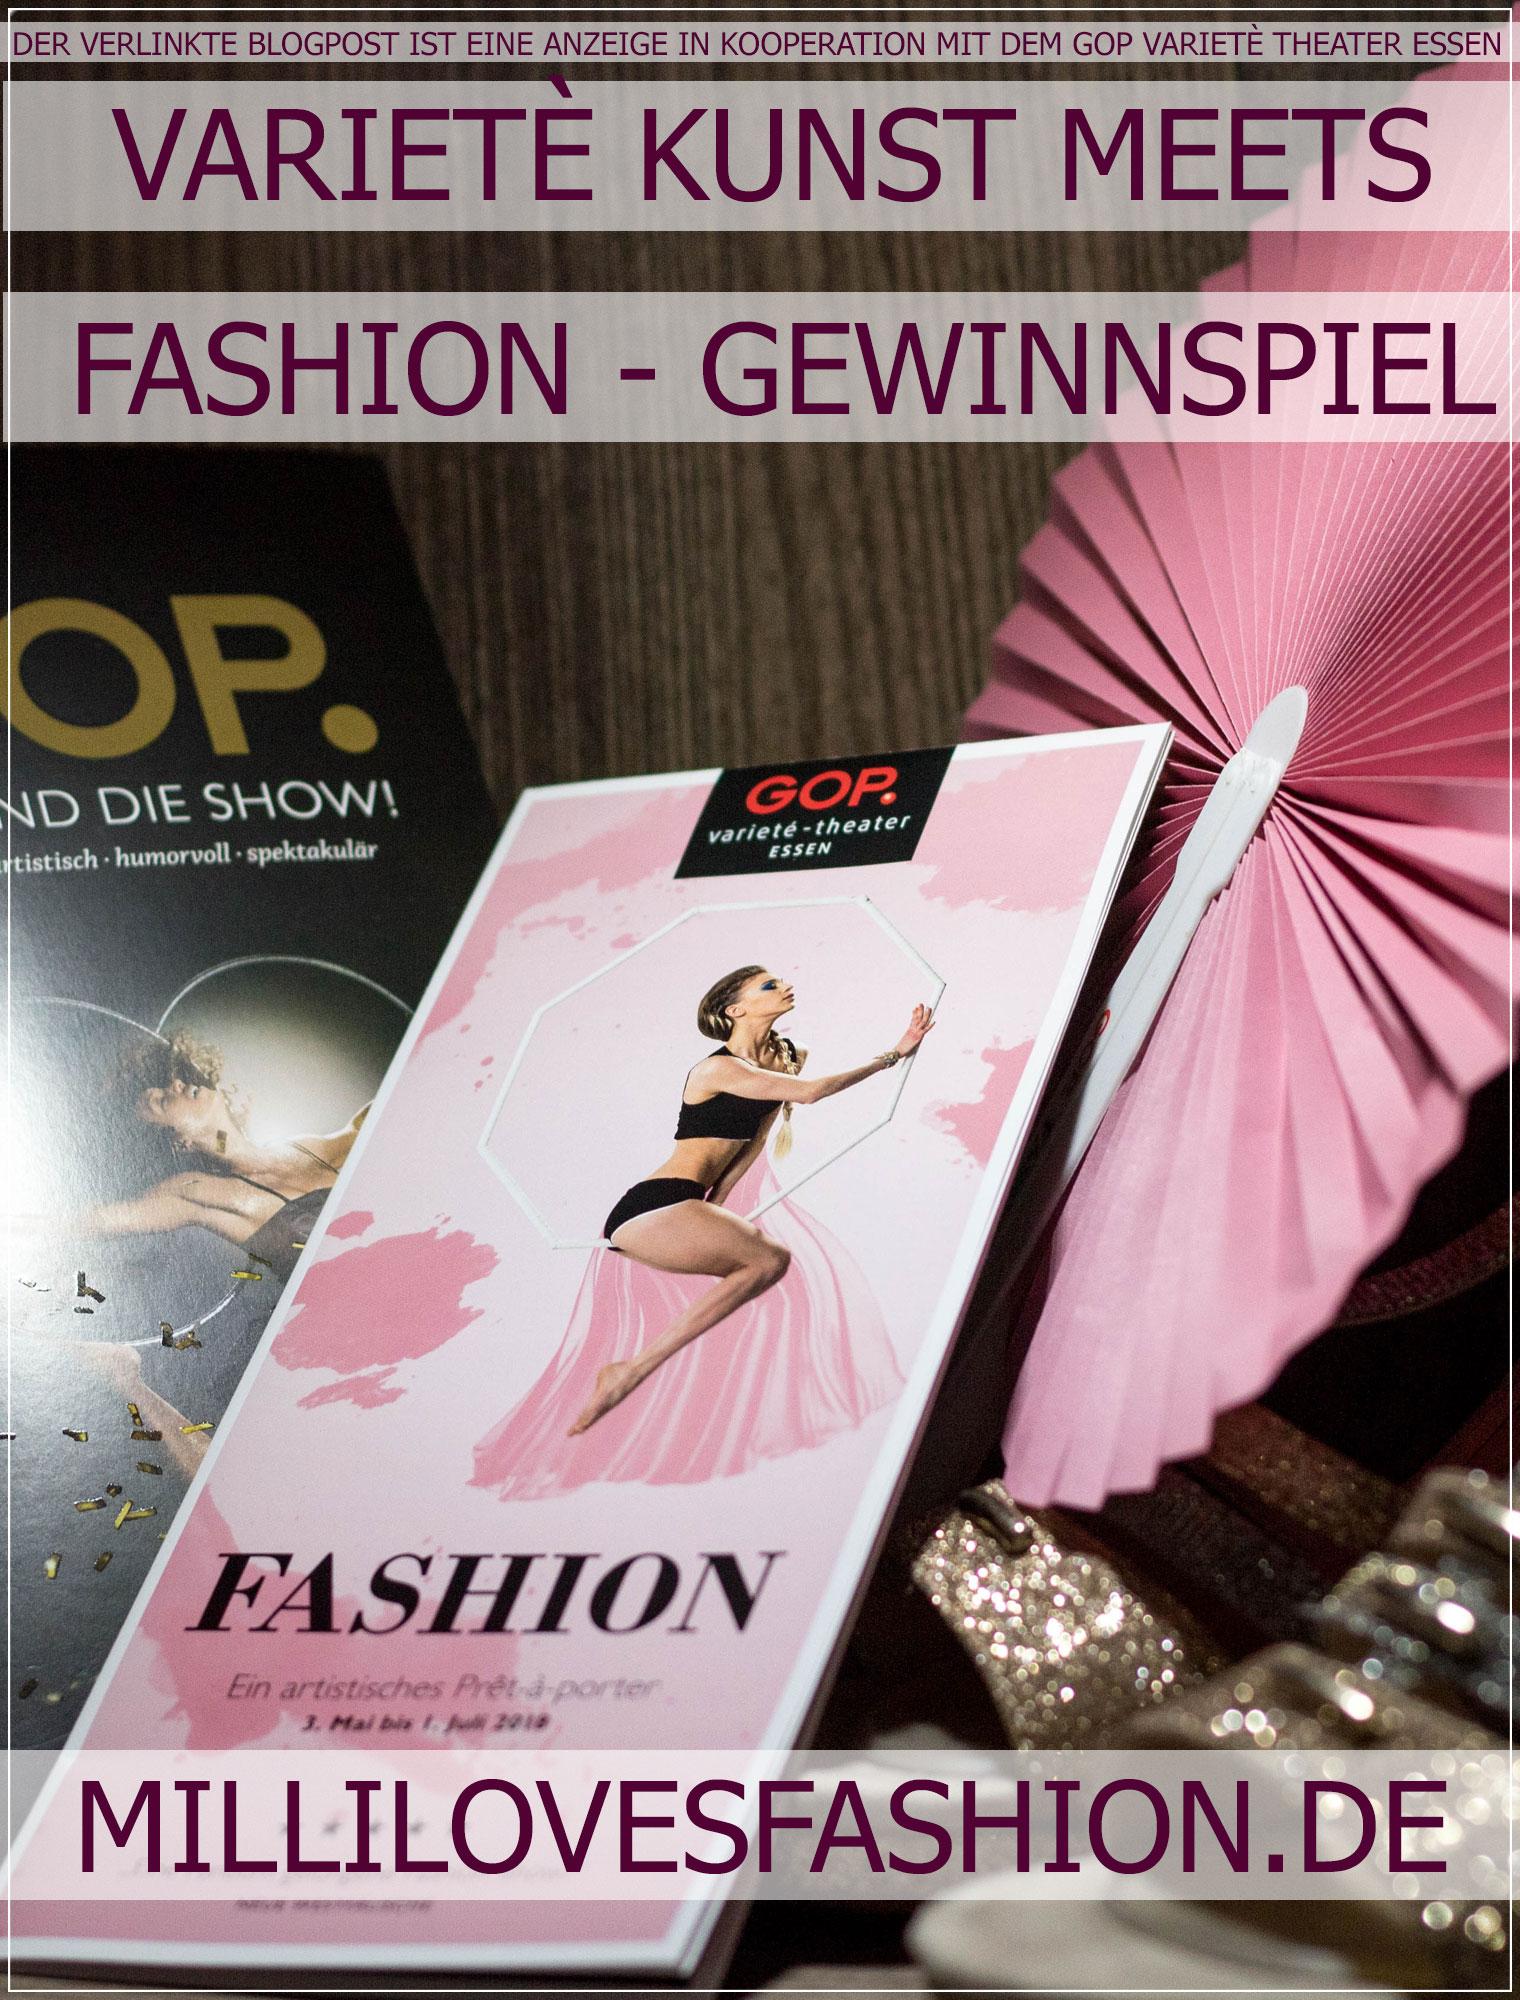 GOP Varieté Theater Essen, GOP Varieté, Fashion, Mode, Gewinnspiel, Theater, Modebloggerin, Fashionbloggerin, Modeblog, Ruhrgebiet